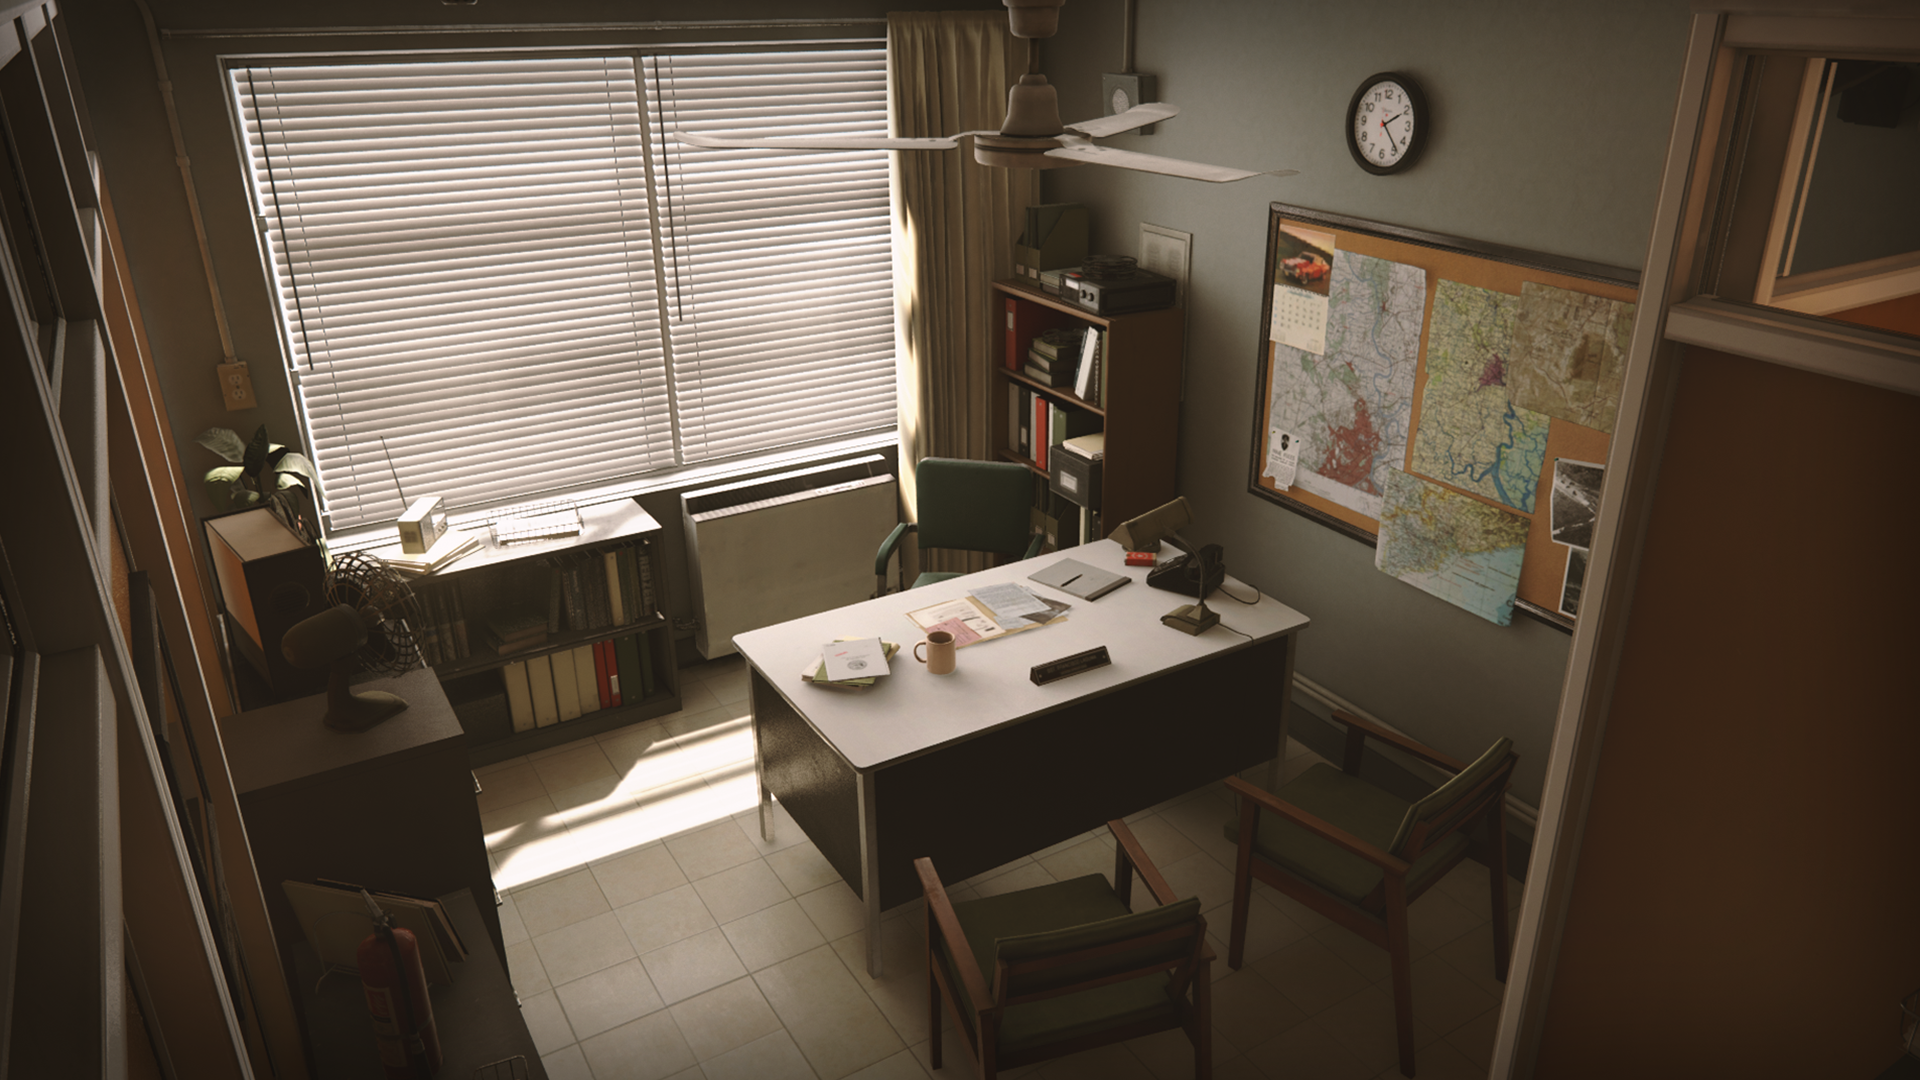 Charmant Retro Office Environment By Dekogon Studios In Environments   UE4  Marketplace